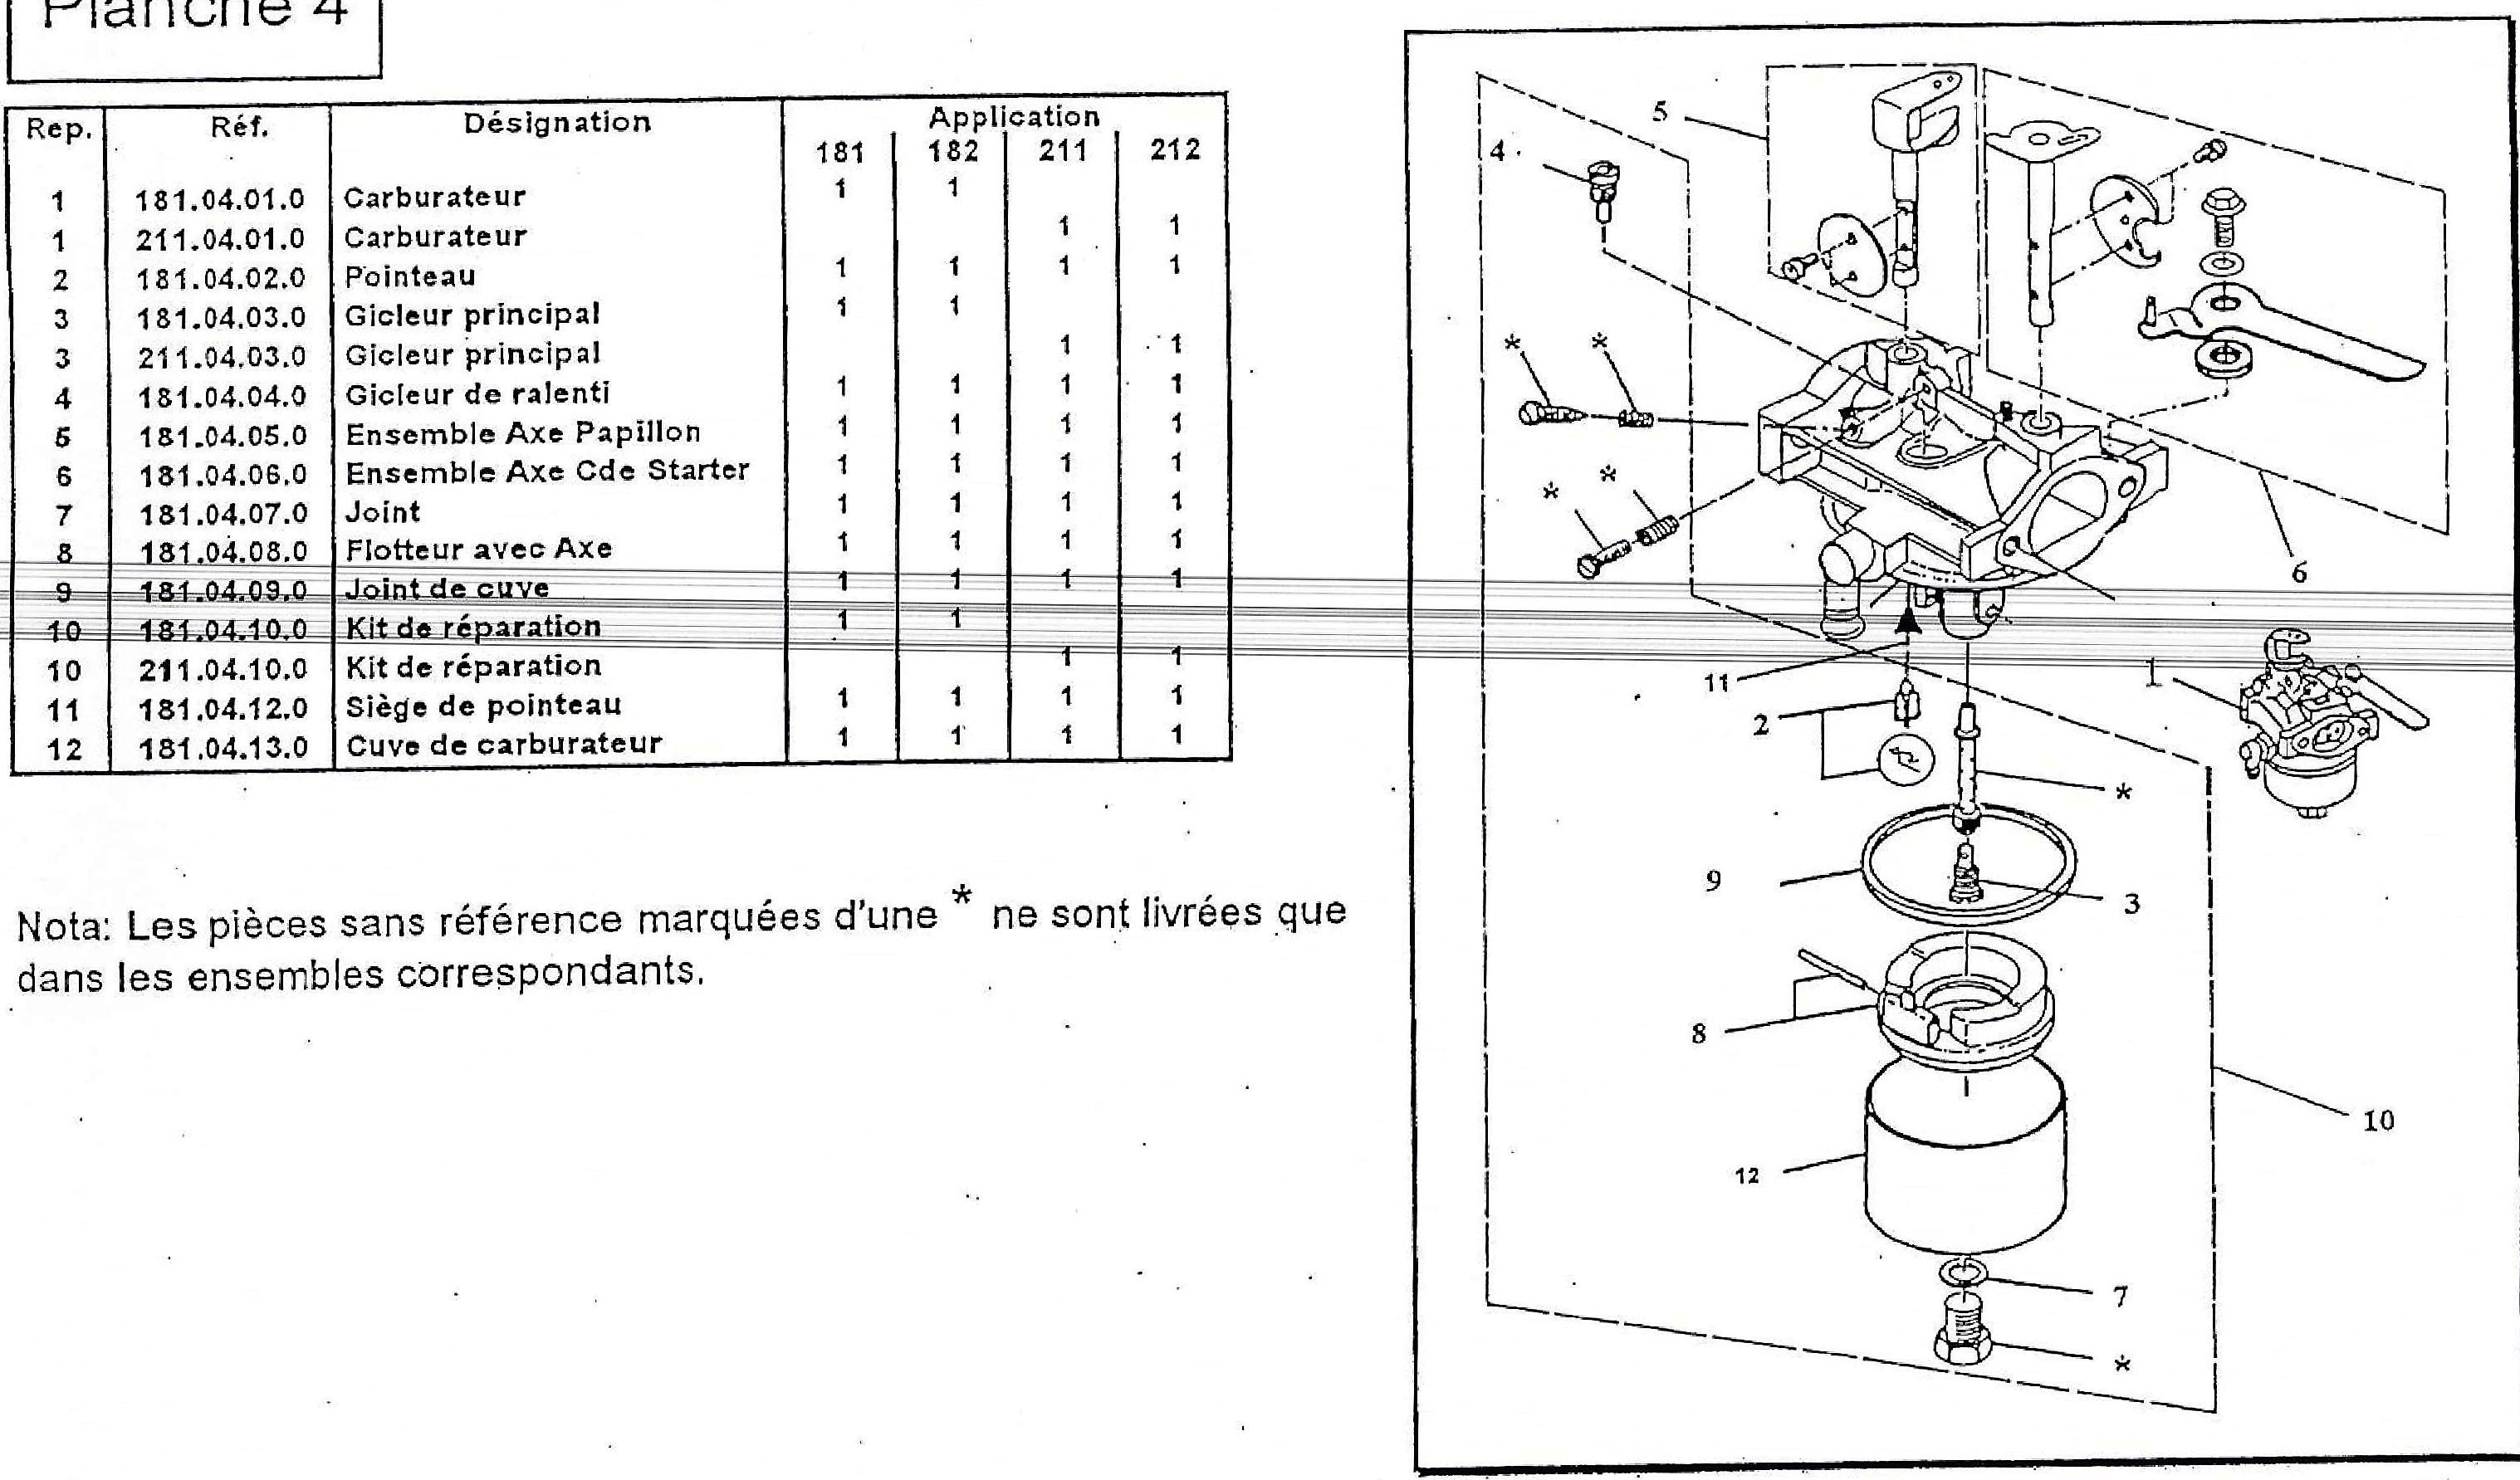 vue eclatee carburateur 181 - 182 - 211 - 212